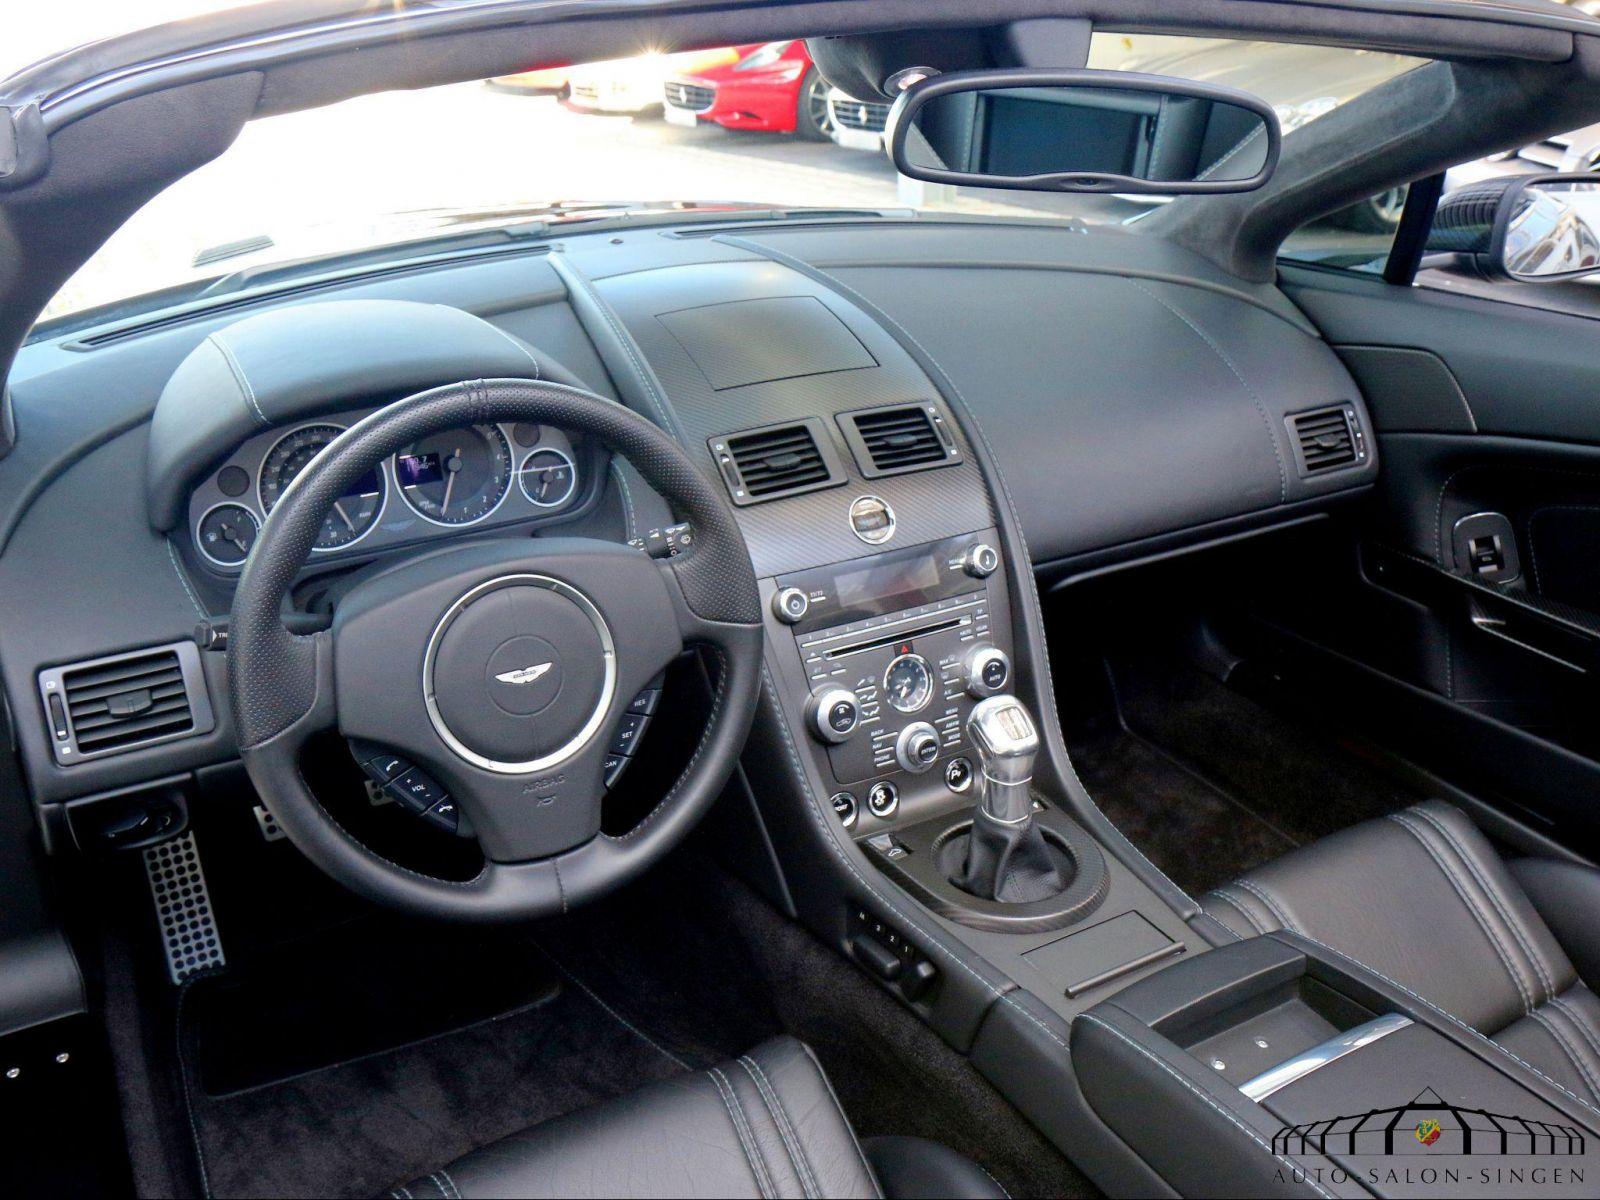 Aston Martin V12 Vantage Roadster Convertible Auto Salon Singen